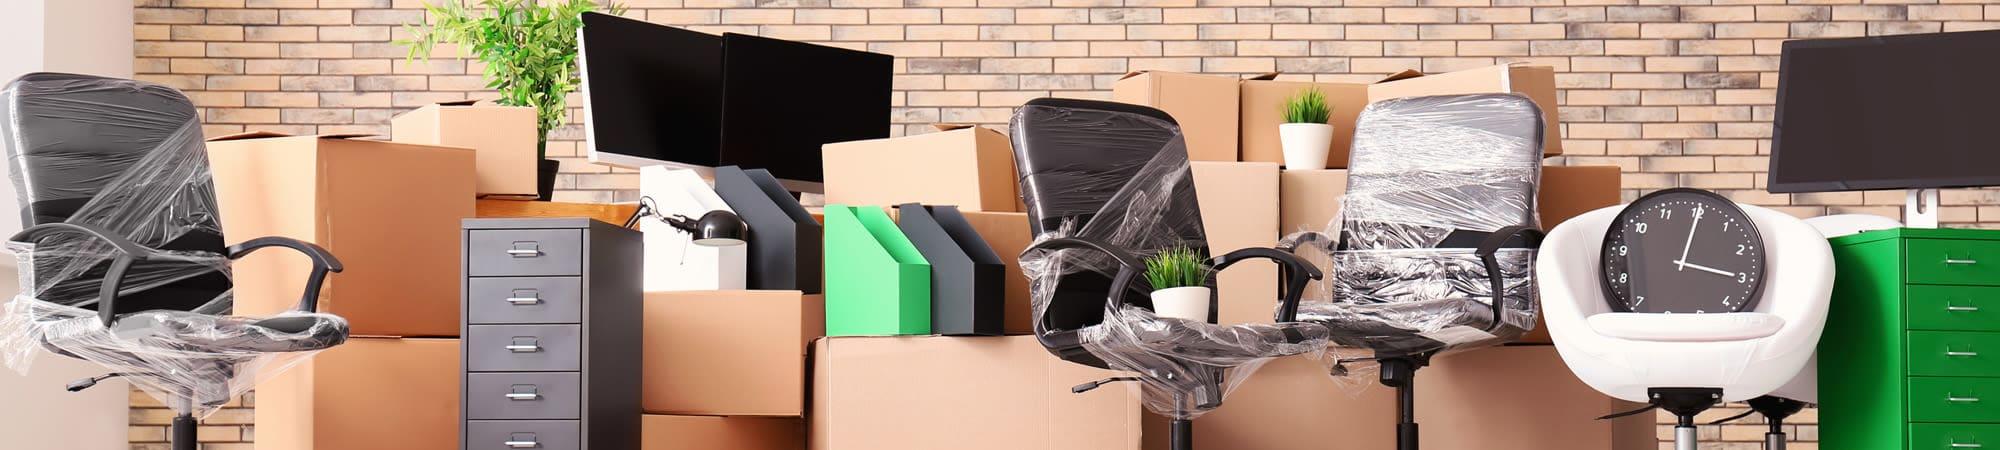 Lock It Up Self Storage storage solutions in Ogden, Utah